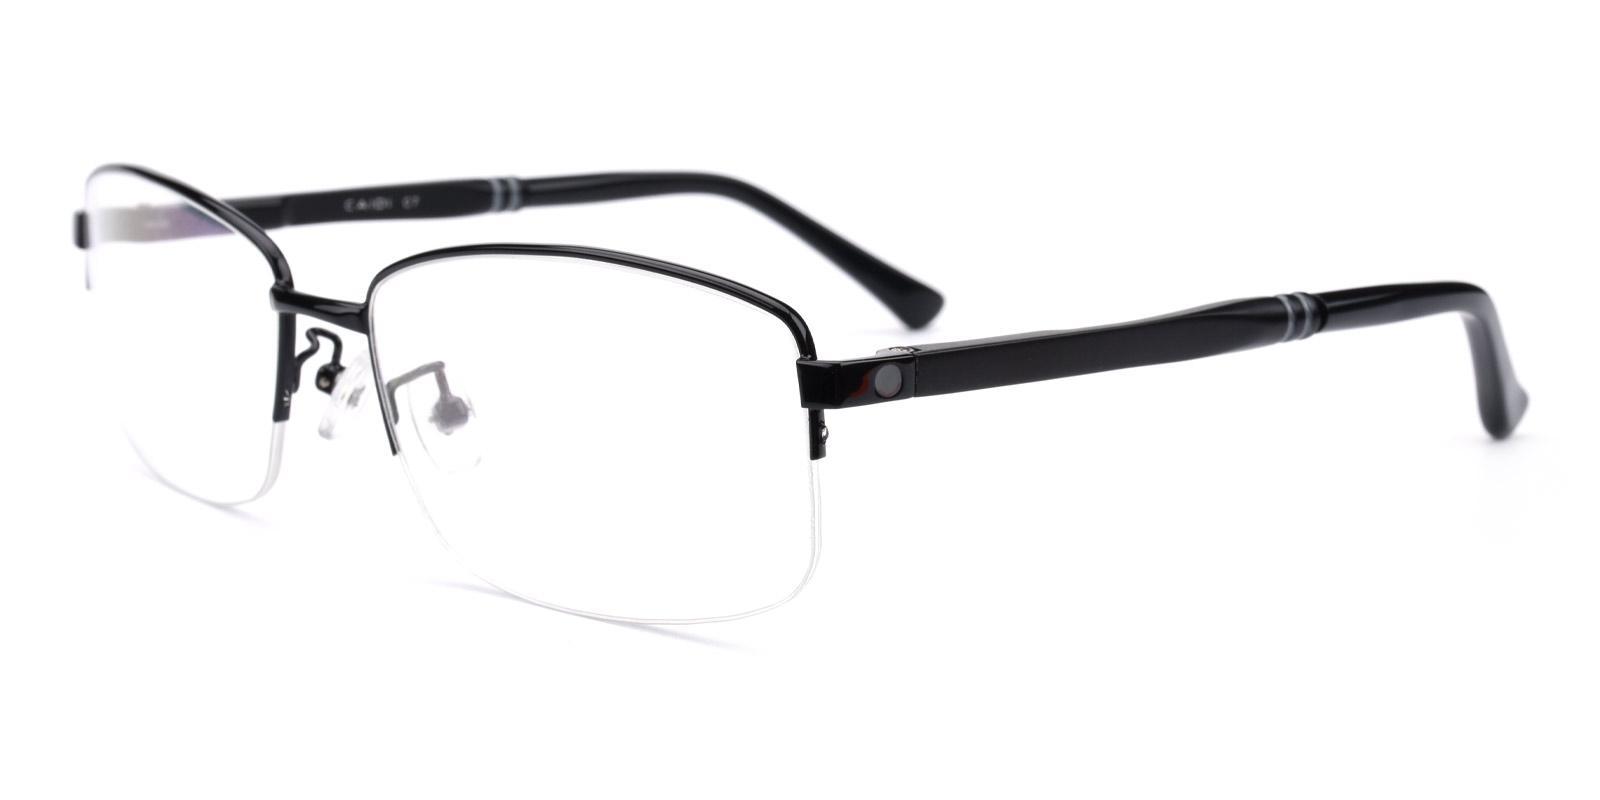 Karma-Black-Rectangle-Metal-Eyeglasses-additional1